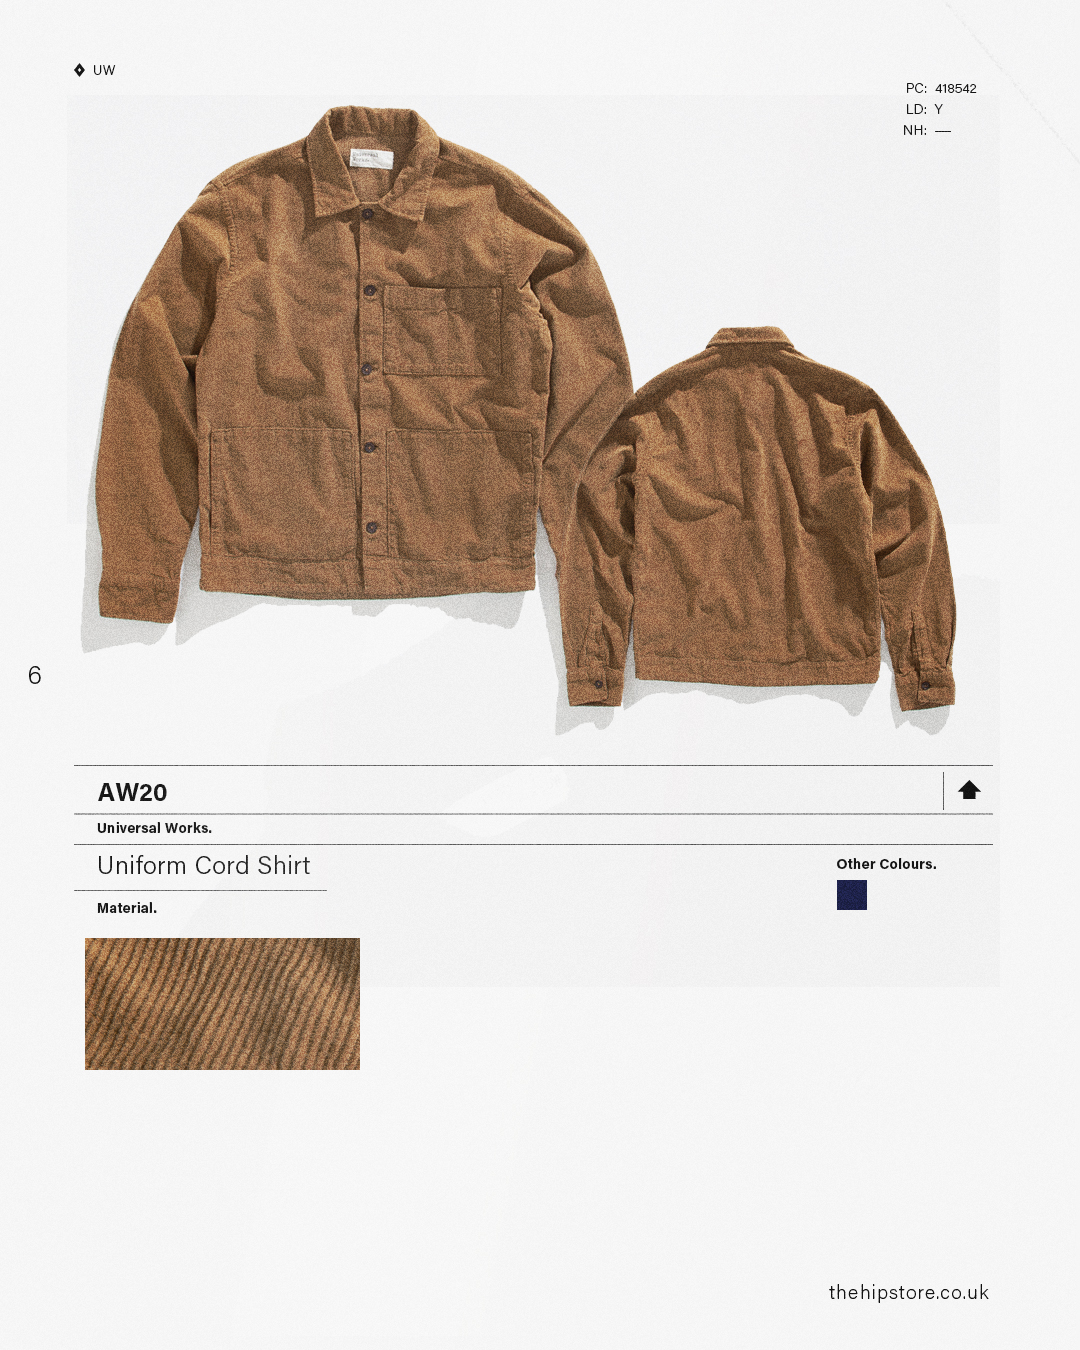 HIP Staff Picks: Universal Works AW20 Uniform Cord Shirt